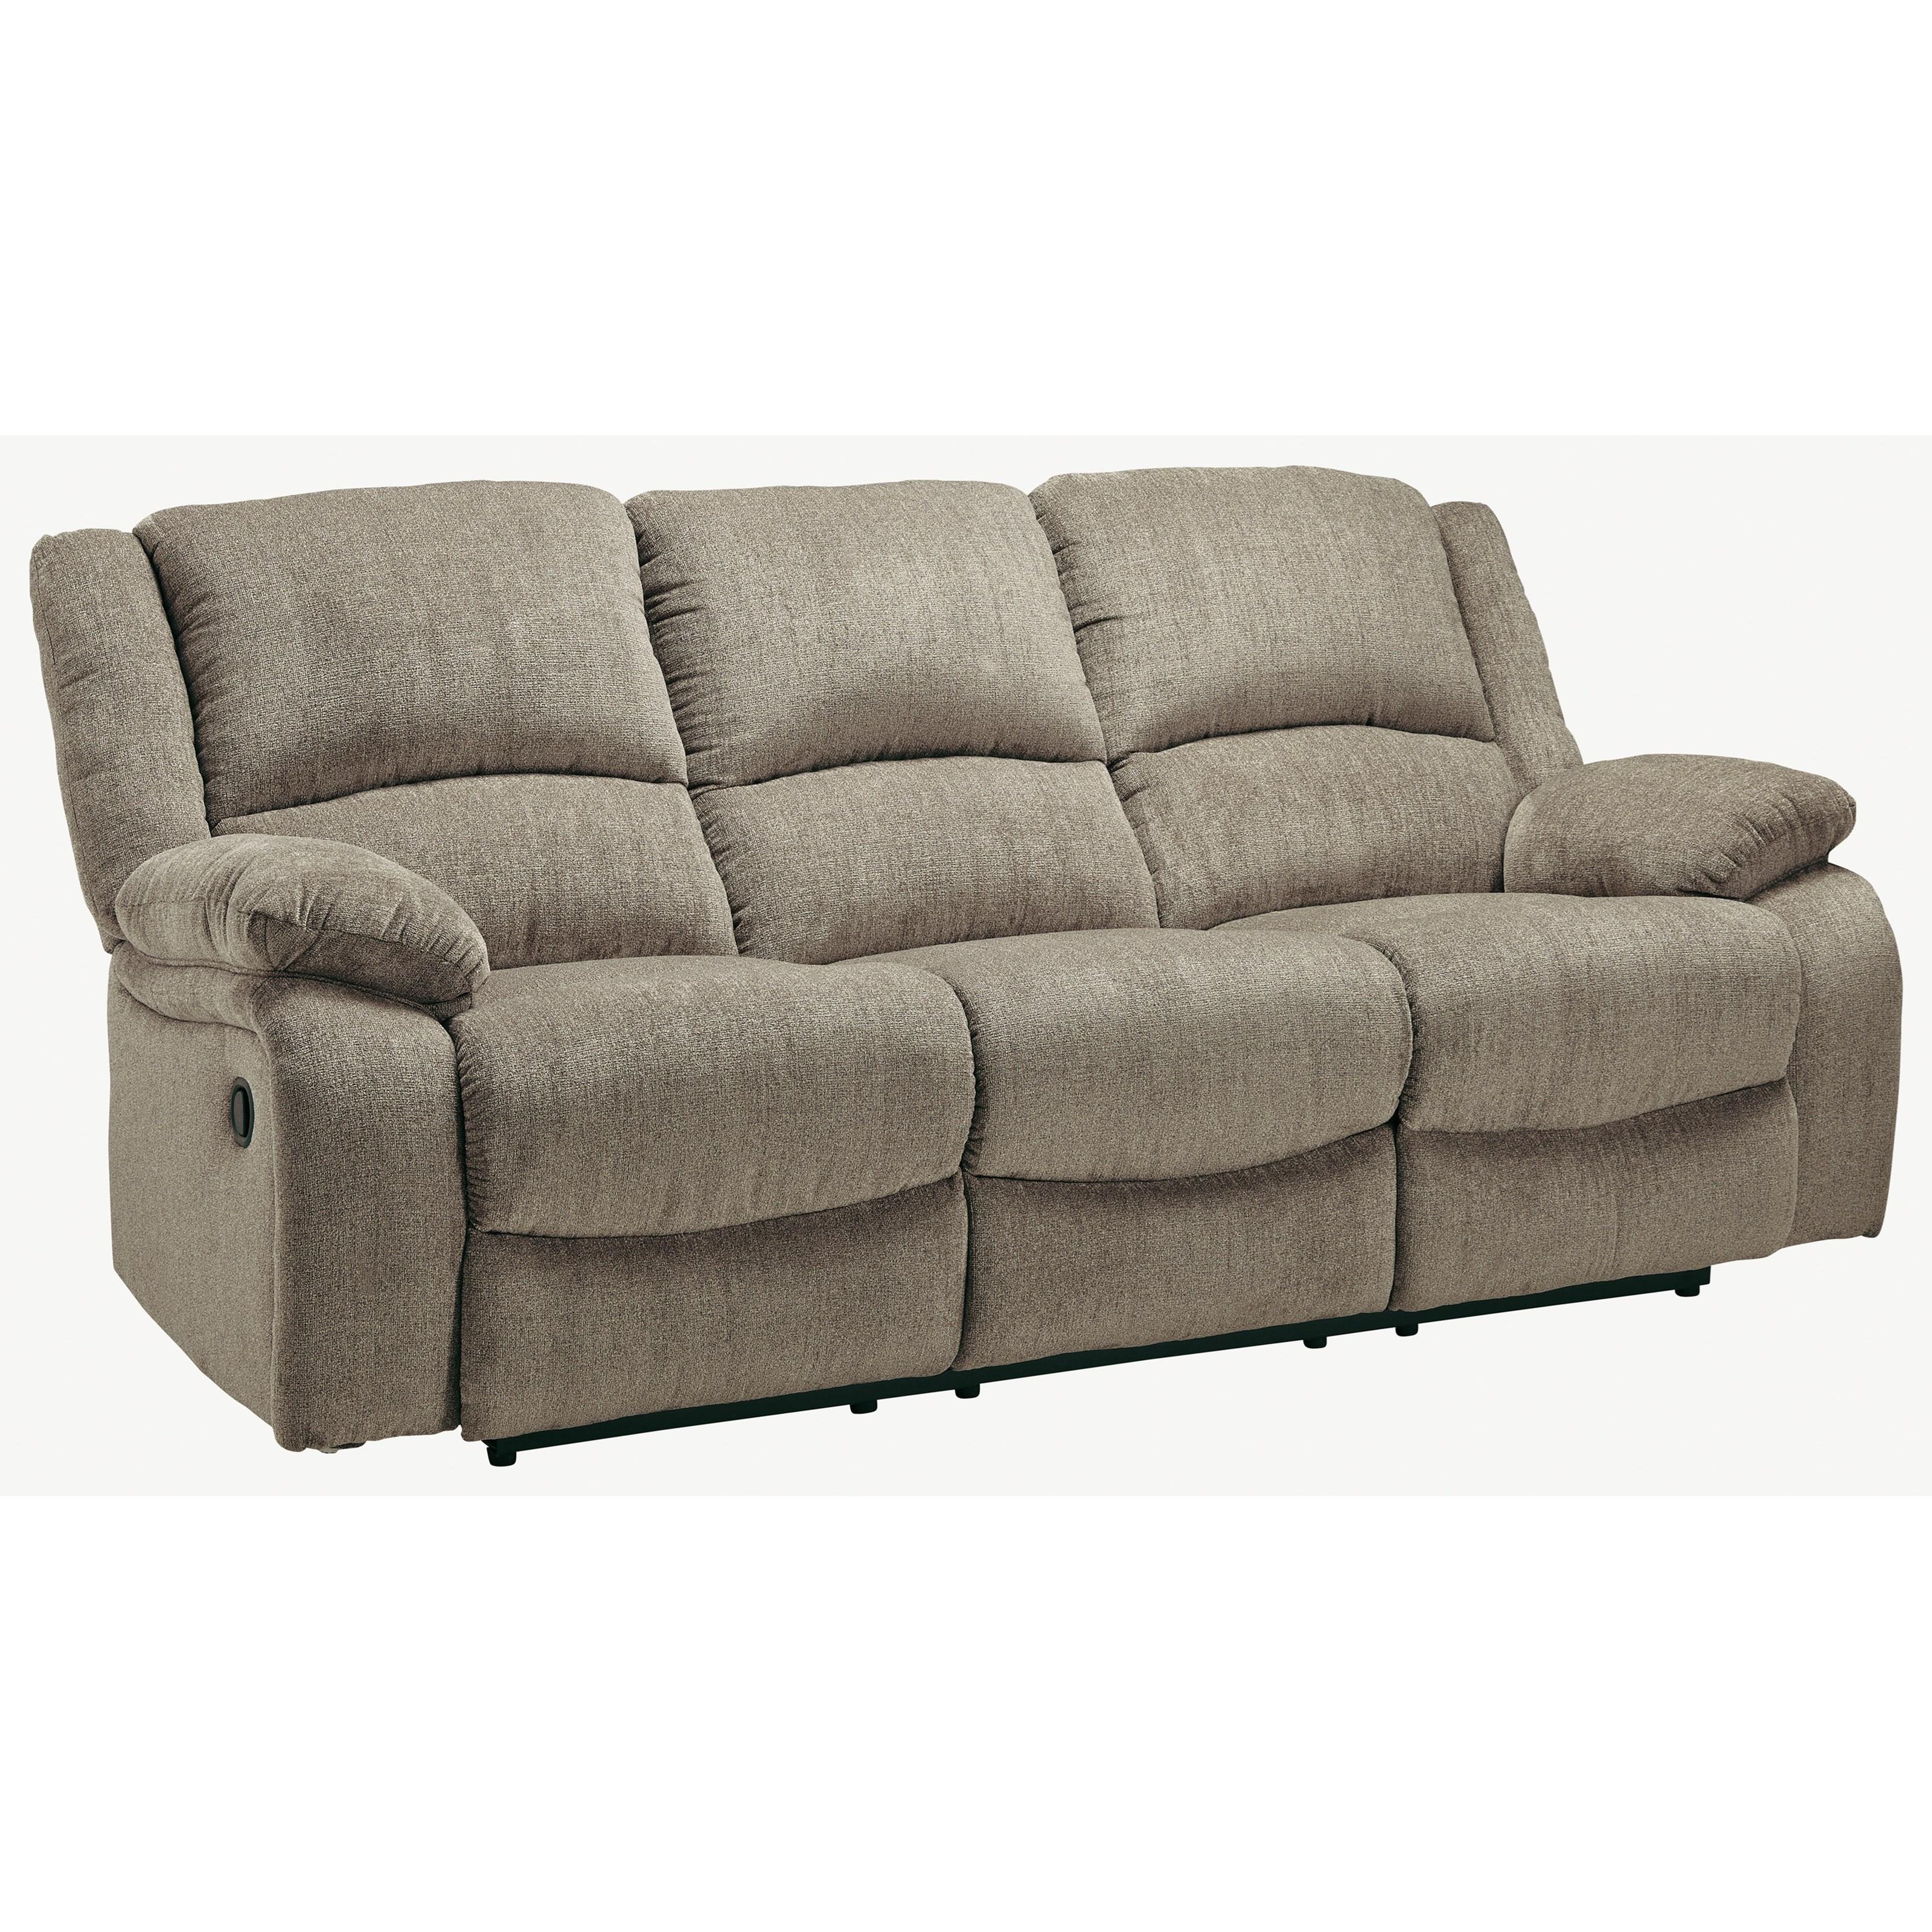 Draycoll Reclining Sofa by Ashley (Signature Design) at Johnny Janosik